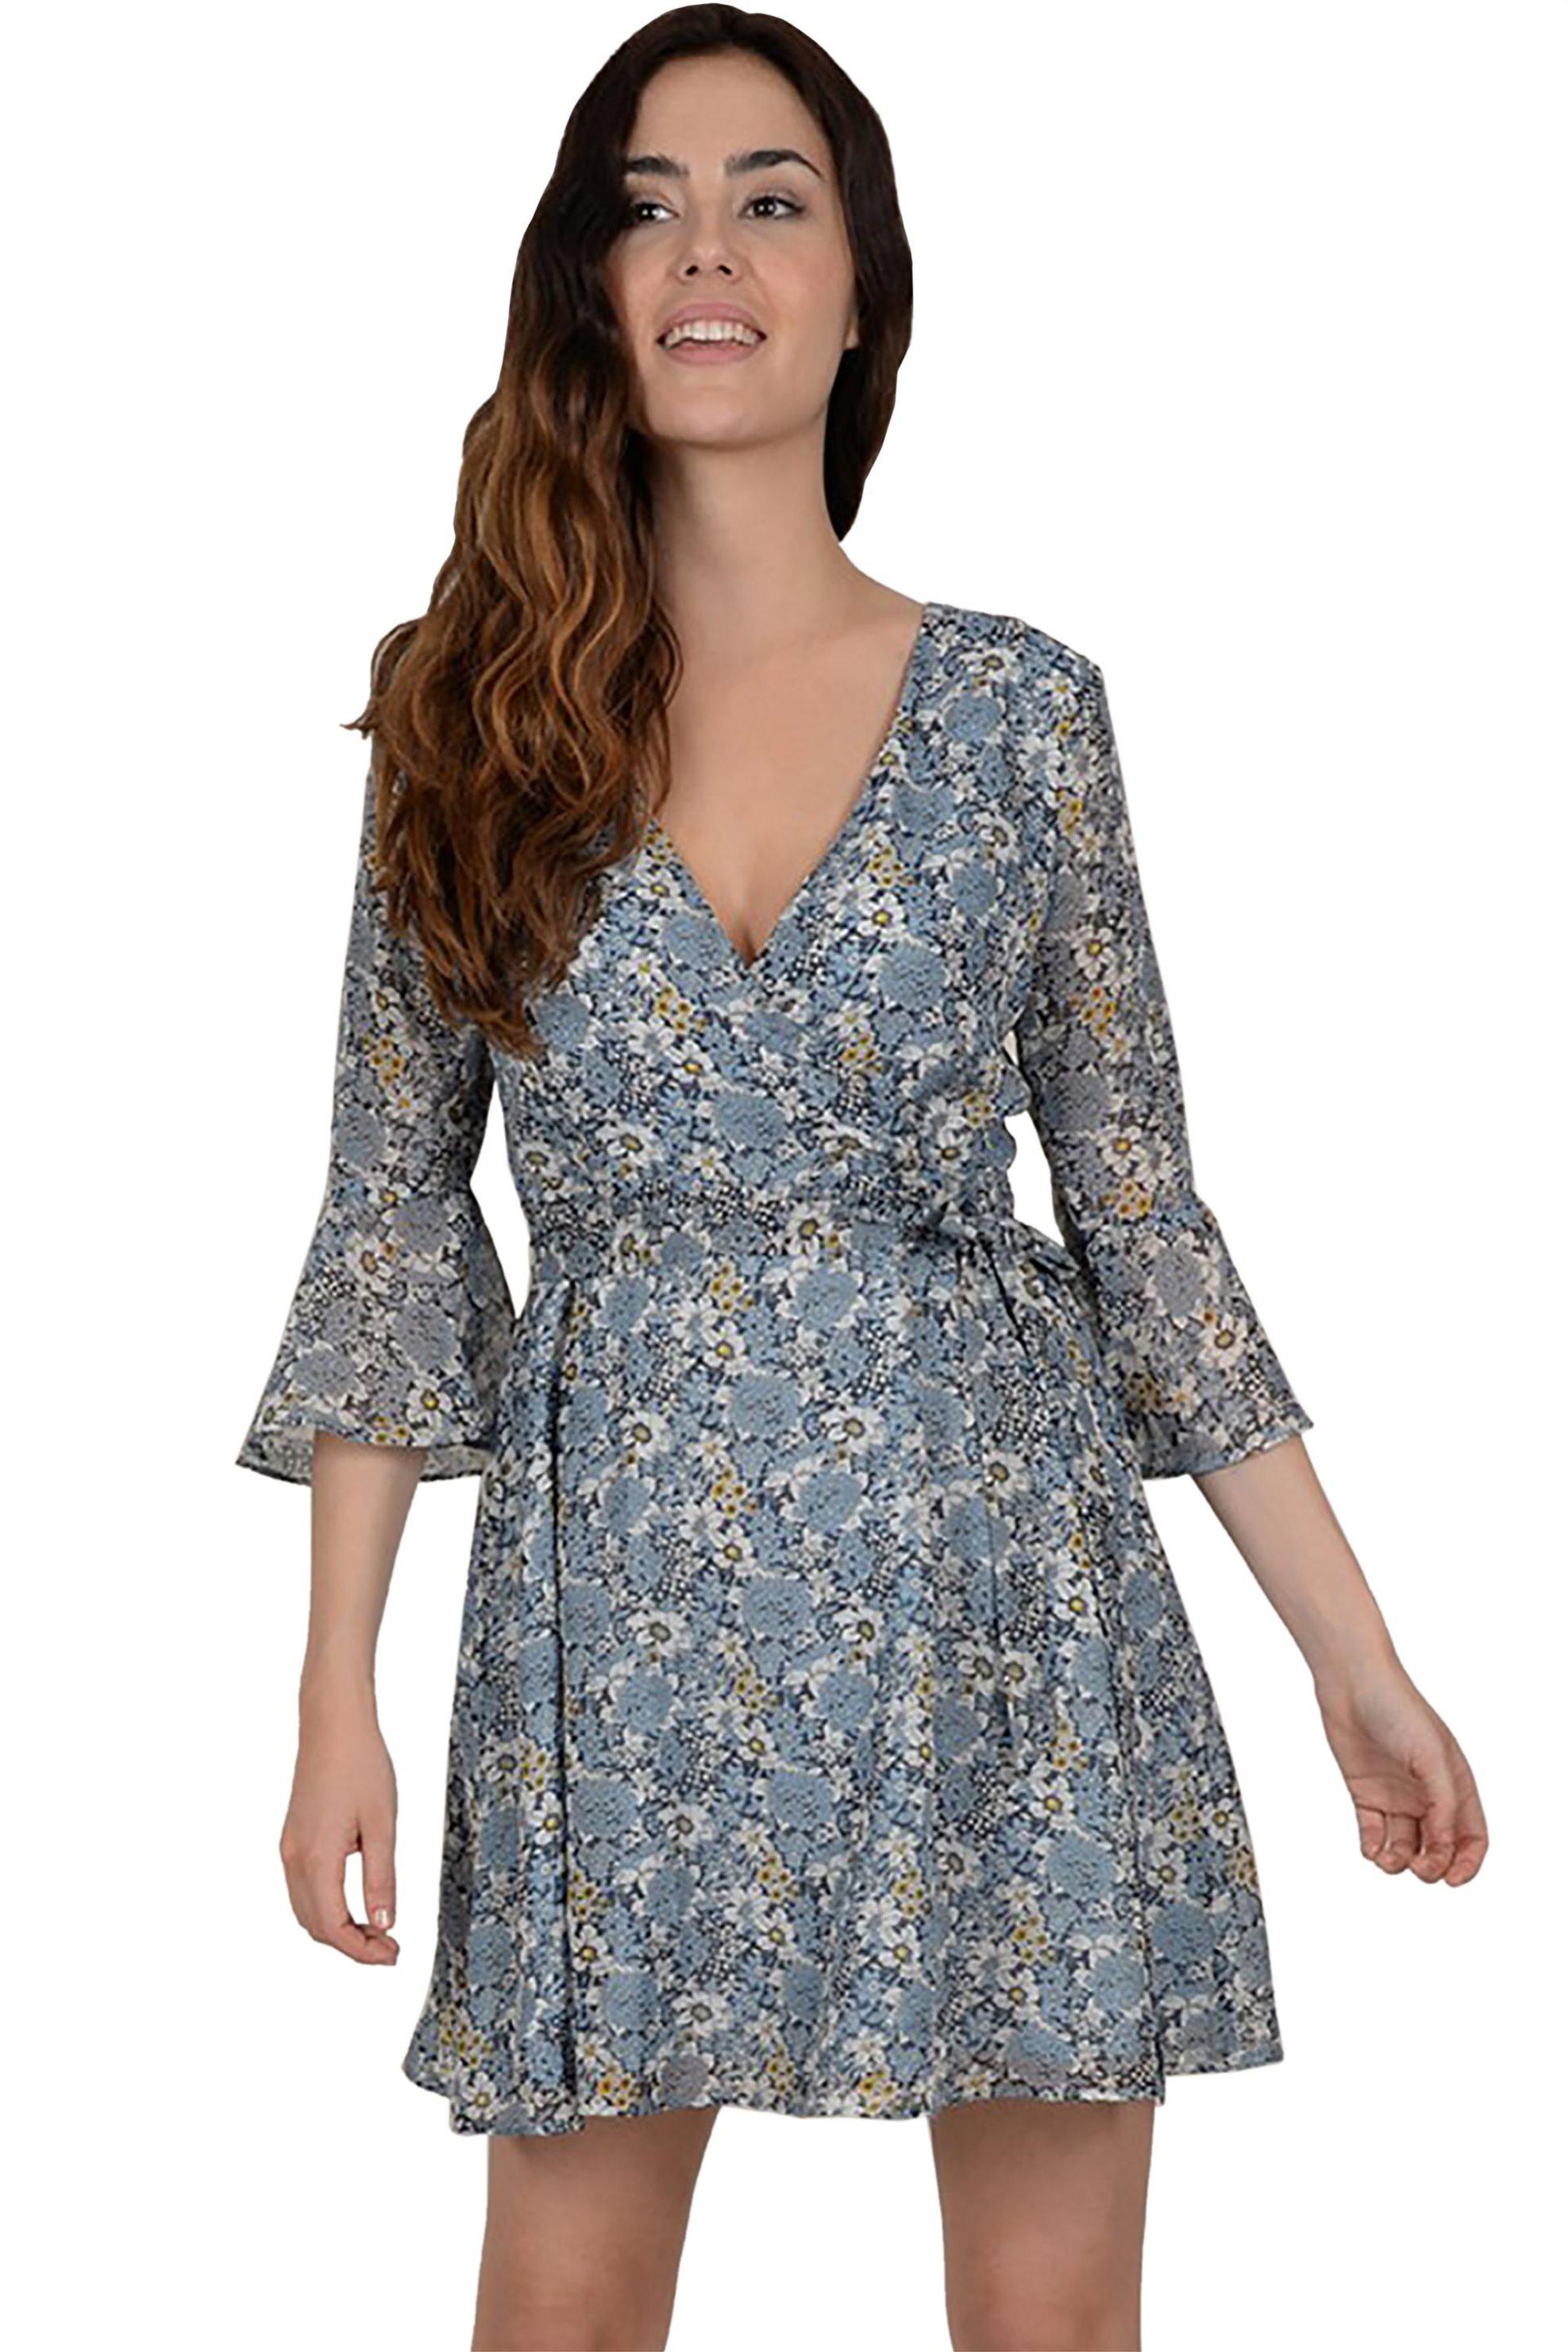 Molly Bracken γυναικείο εμπριμέ wrap mini φόρεμα με ζωνάκι - S19MB-T824A - Γαλάζ γυναικα   ρουχα   φορέματα   mini φορέματα